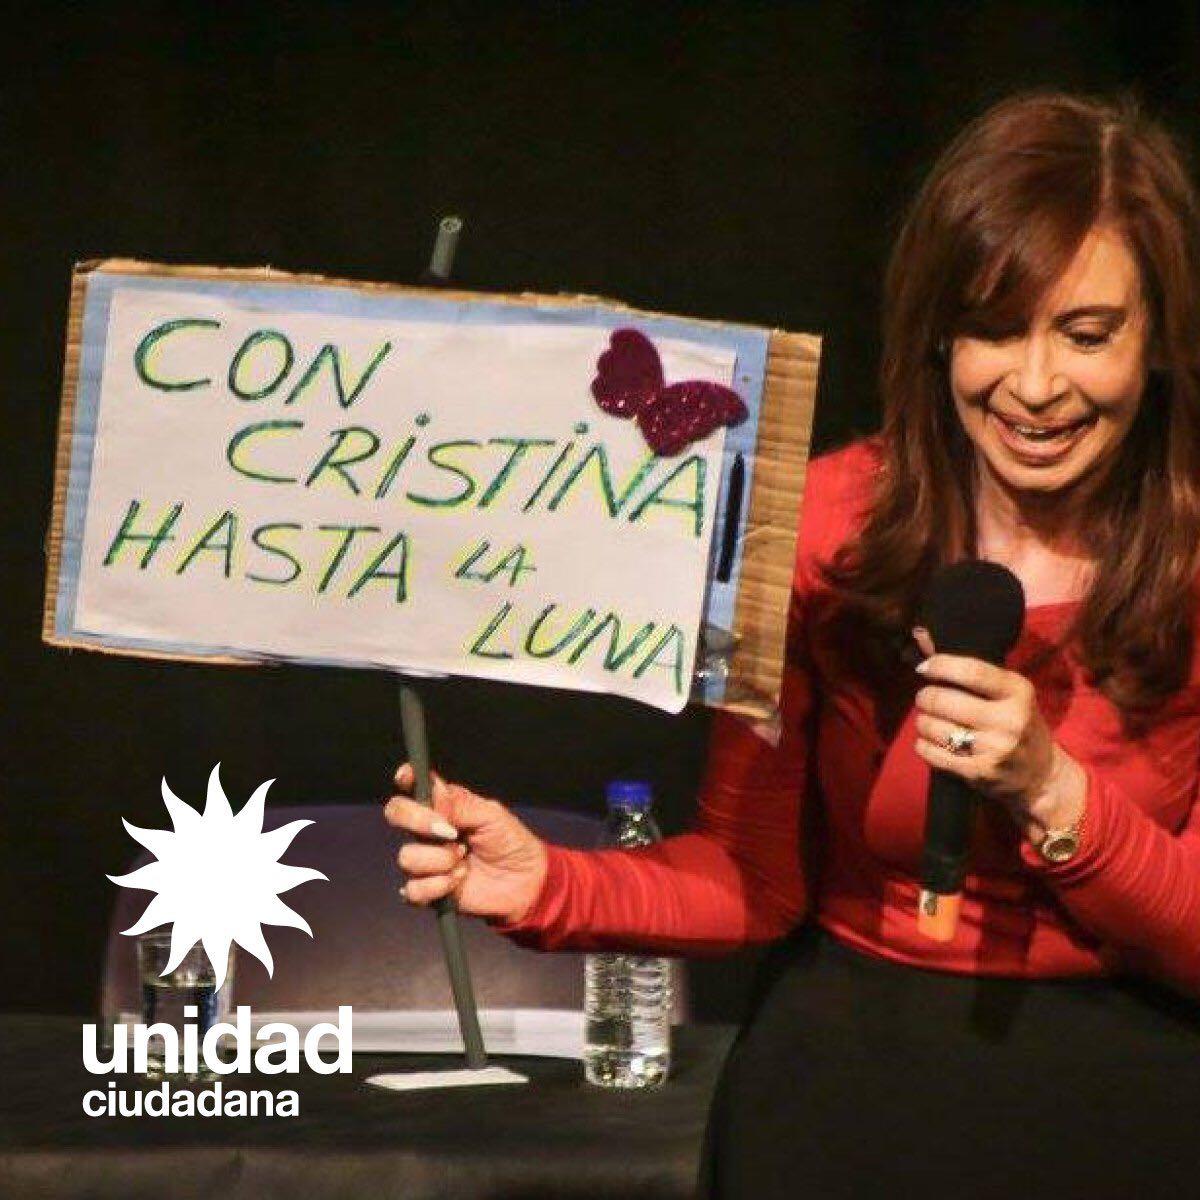 IDA Y VUELTA...  #Suma2Votos Radio Nacional Córdoba Holan #YoApoyoAGilsCarbo  #UnidadCiudadana https://t.co/z3deDMDiXl